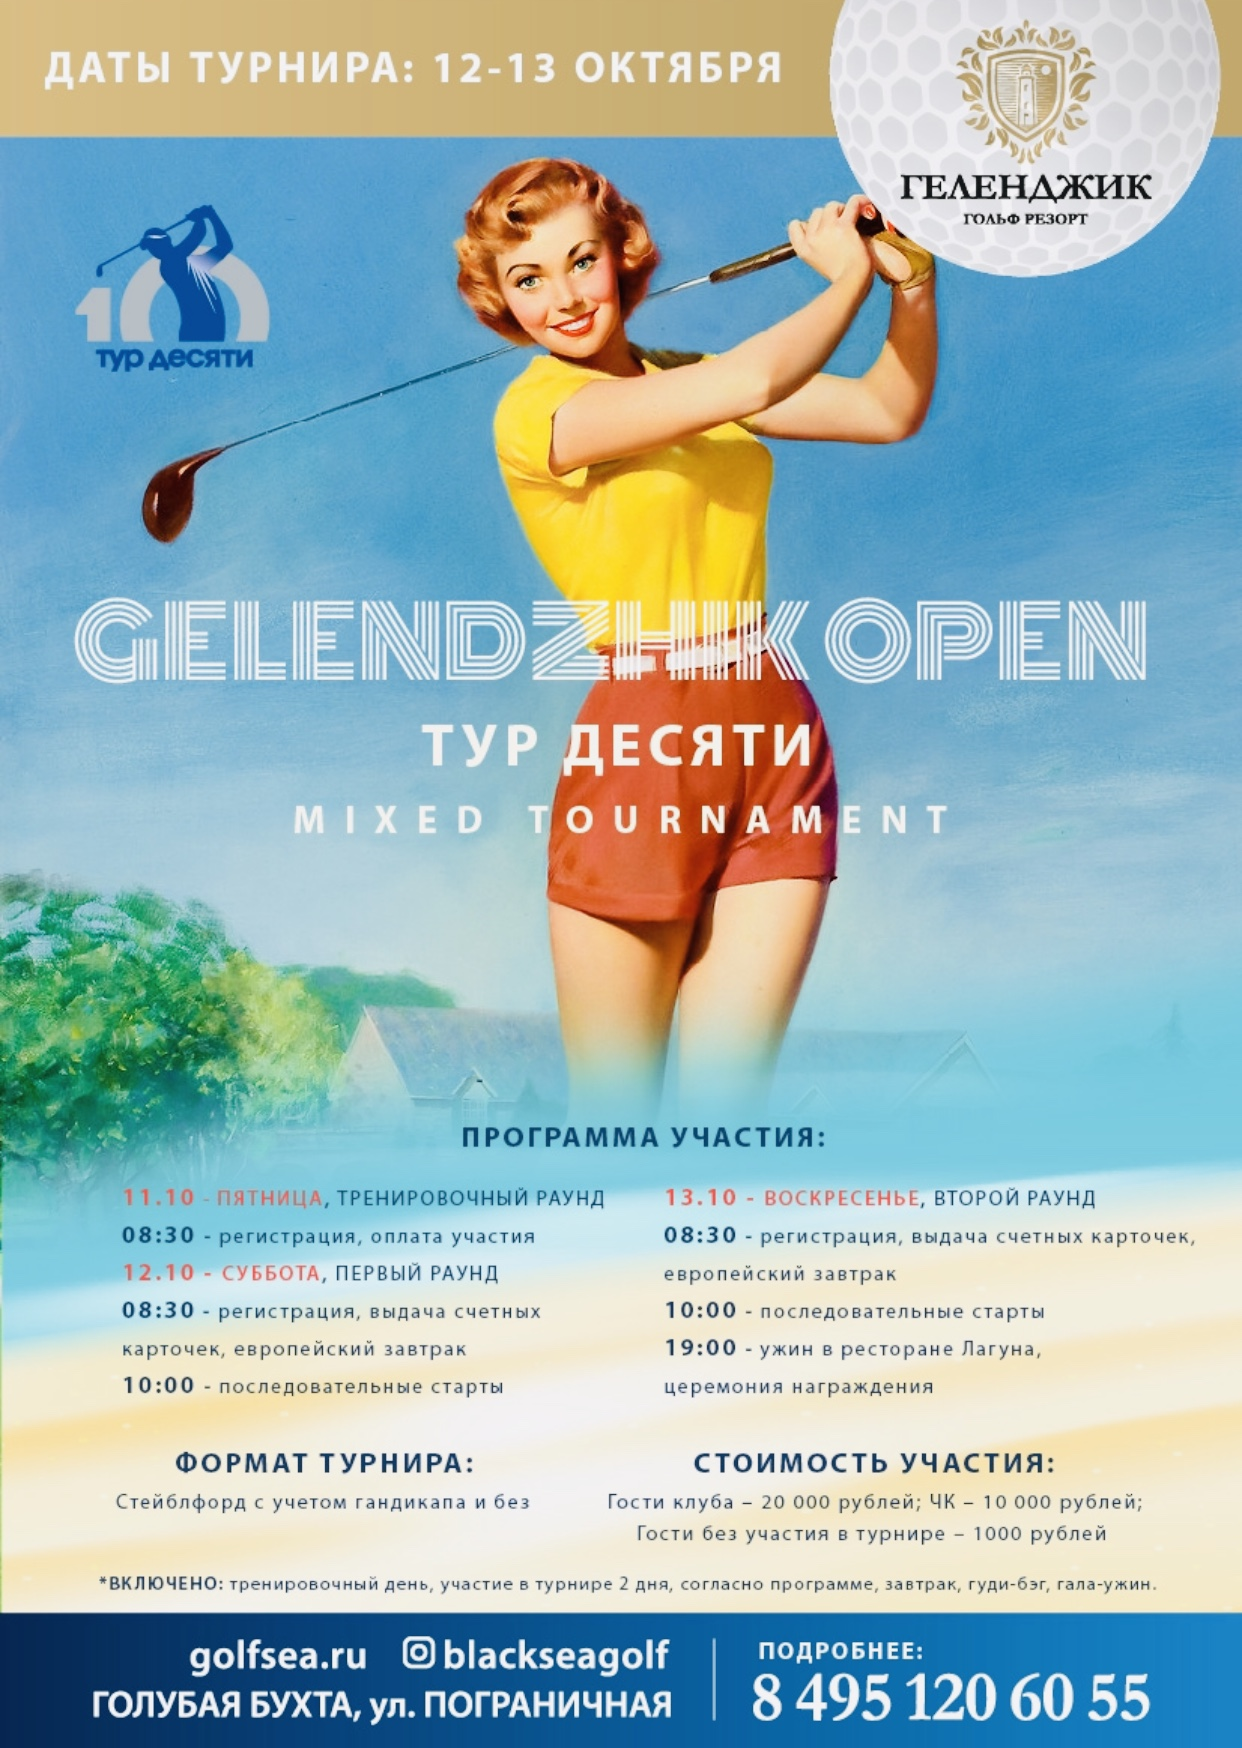 12-13 октября, Gelendzhik Open. «Тур Десяти». Mixed Tournament.